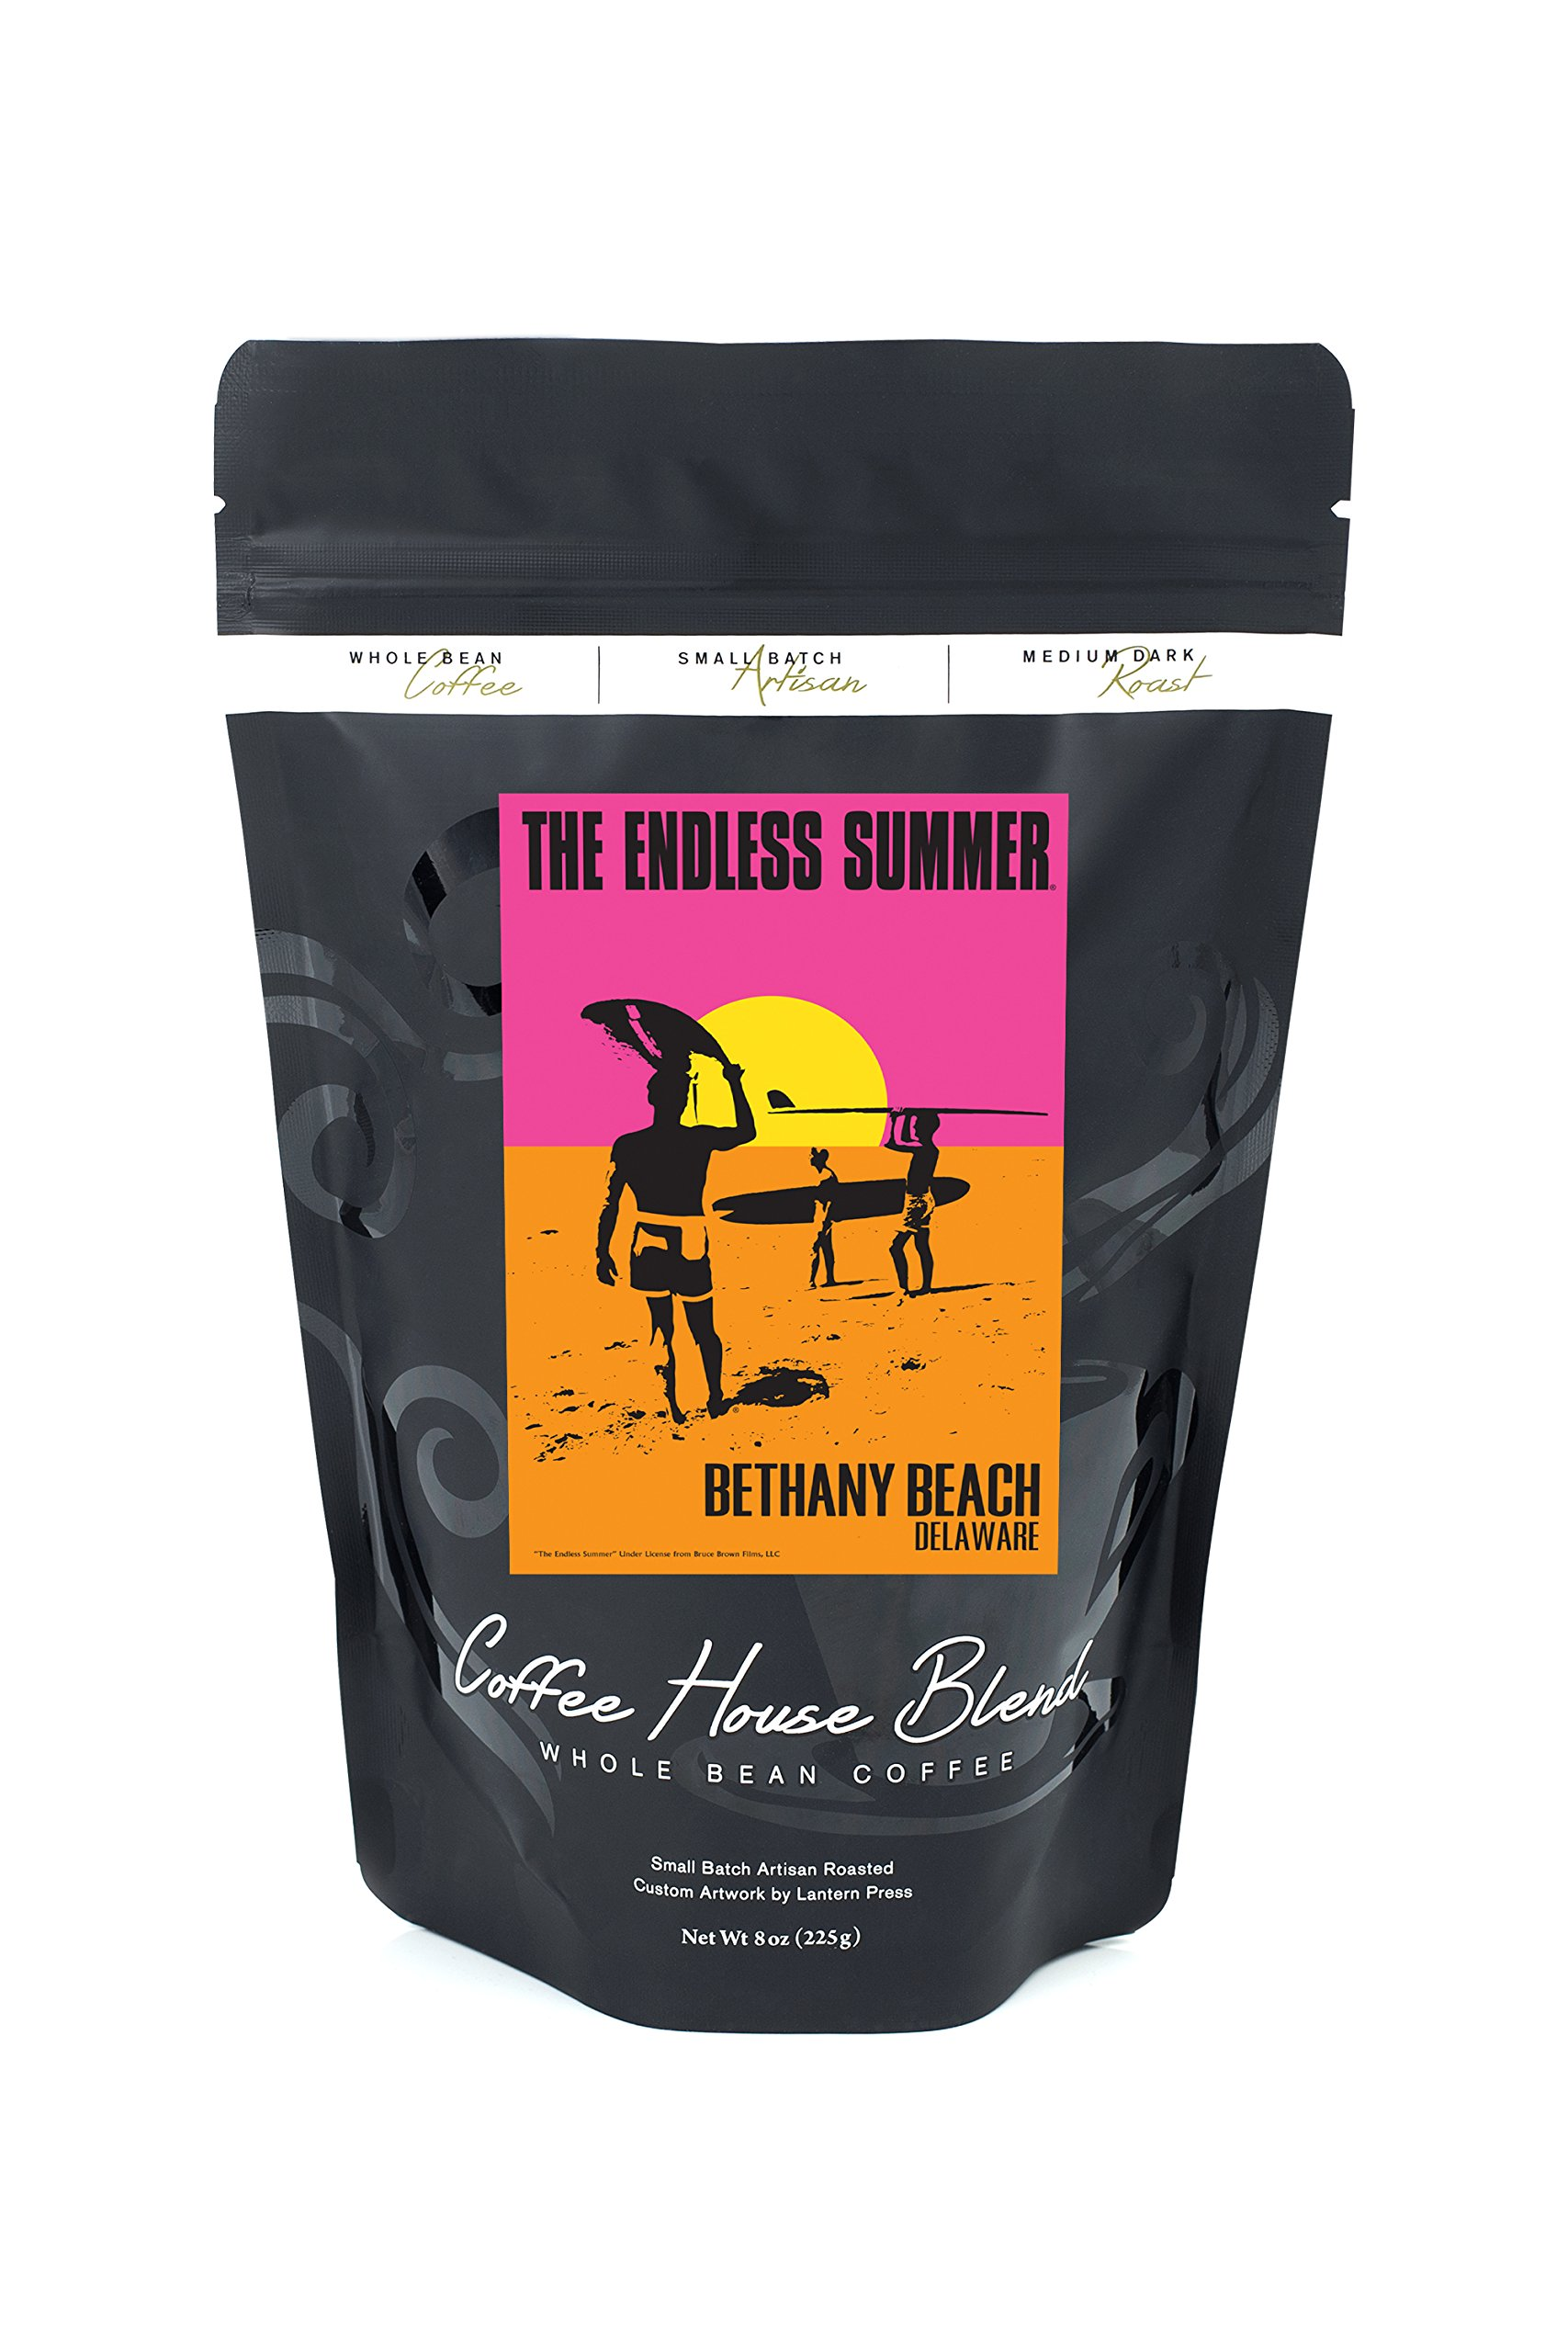 Bethany Beach, Delaware - The Endless Summer - Original Movie Poster (8oz Whole Bean Small Batch Artisan Coffee - Bold & Strong Medium Dark Roast w/ Artwork)